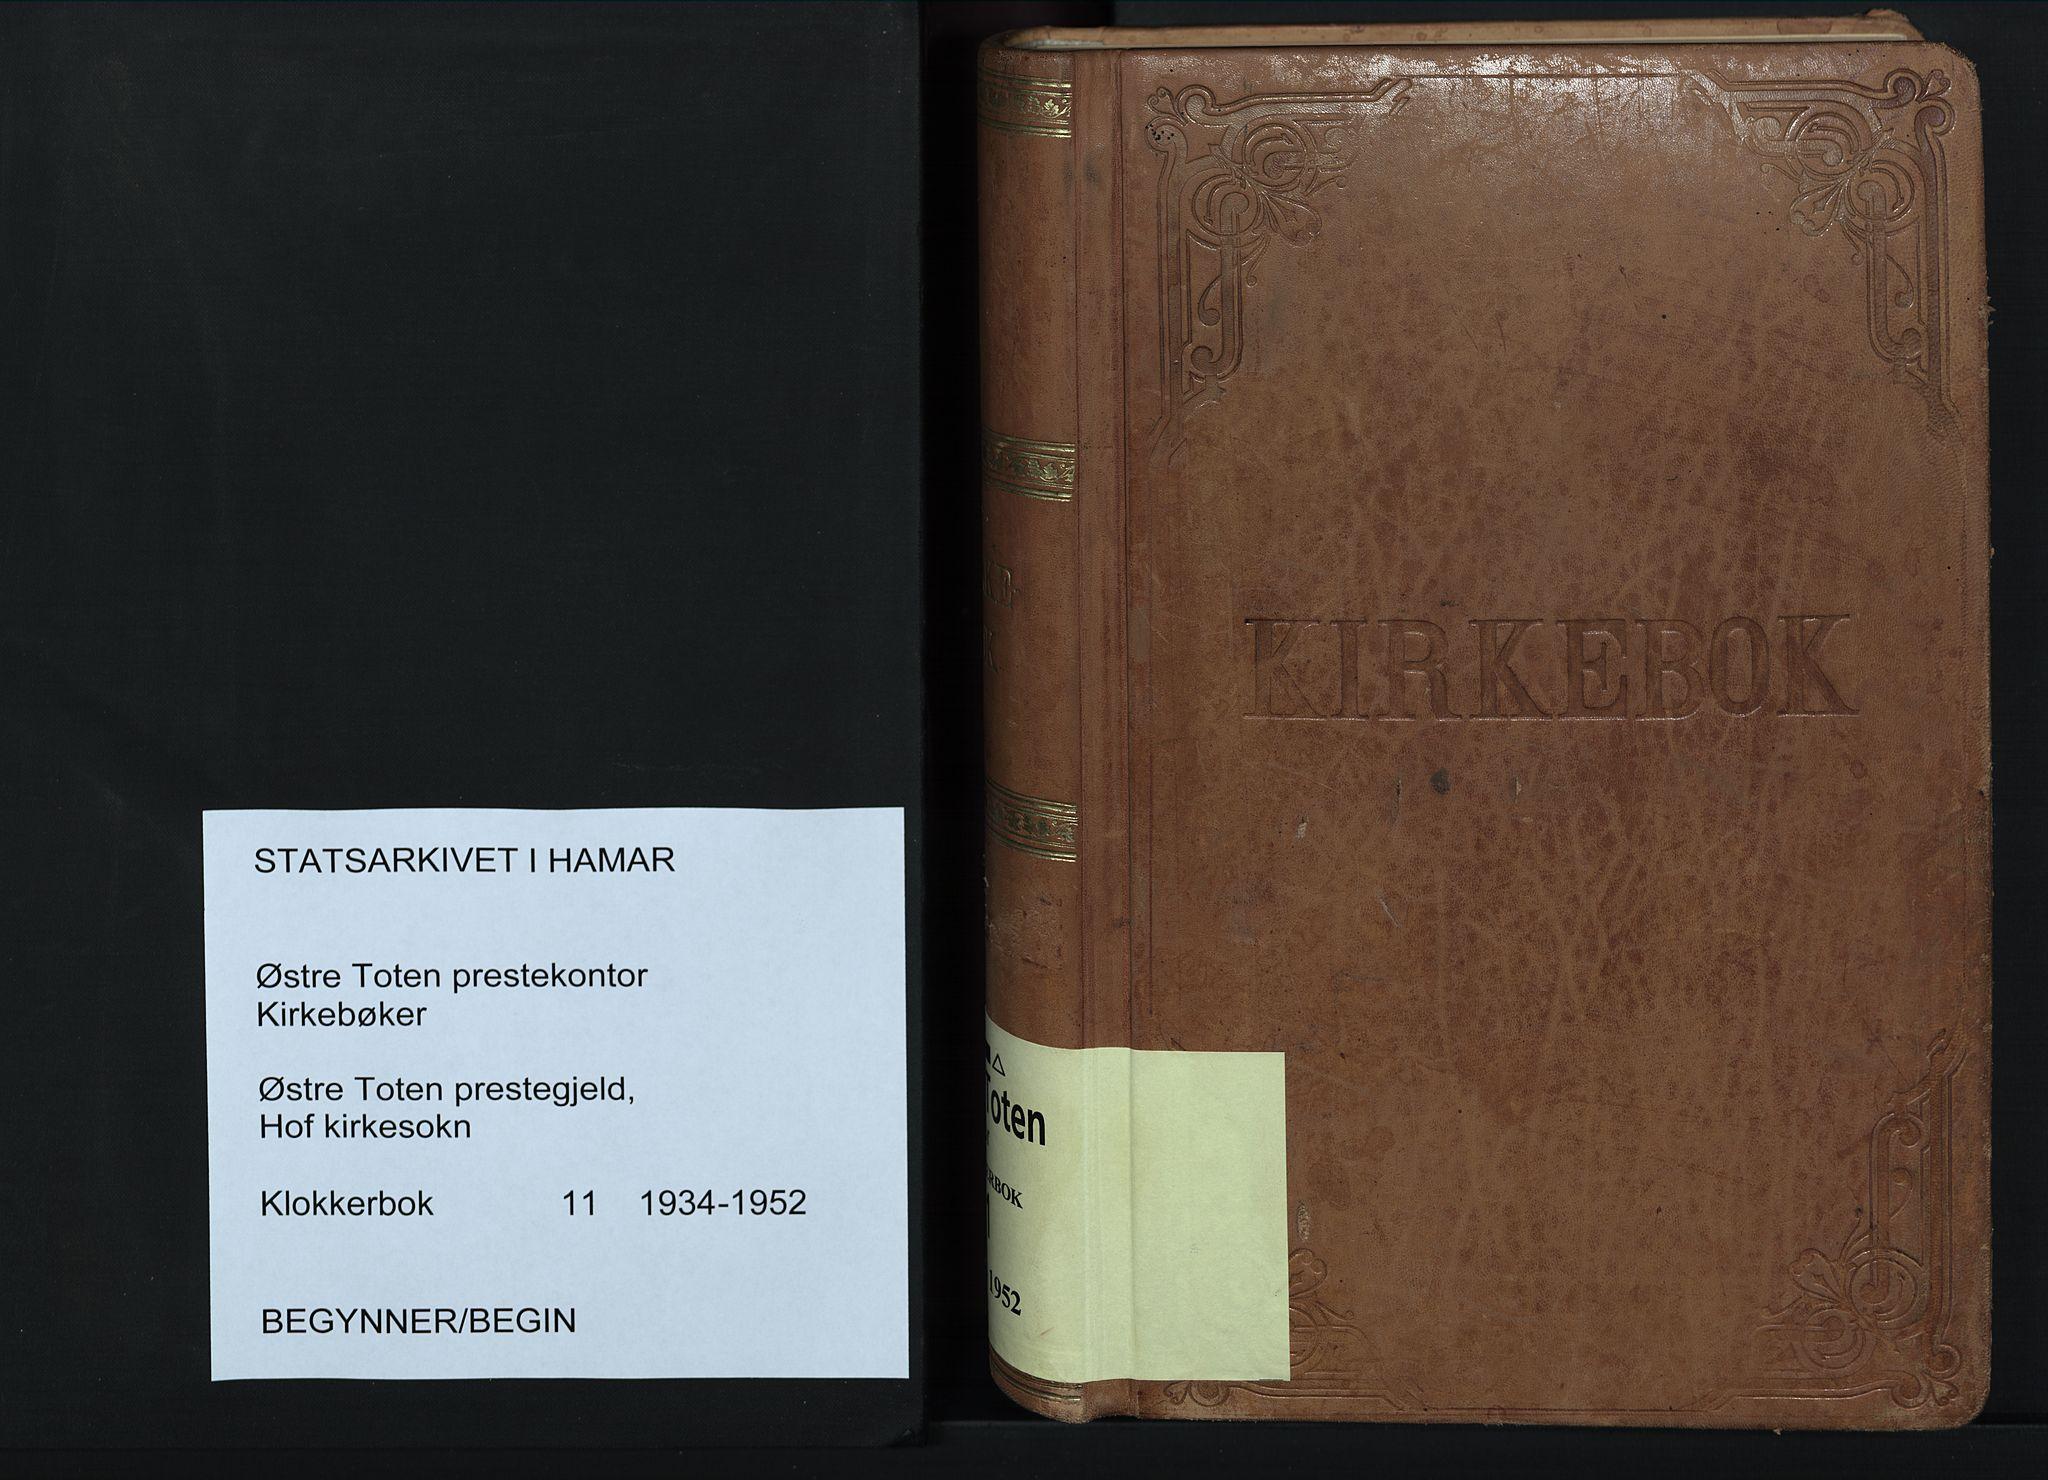 SAH, Østre Toten prestekontor, Klokkerbok nr. 11, 1934-1952